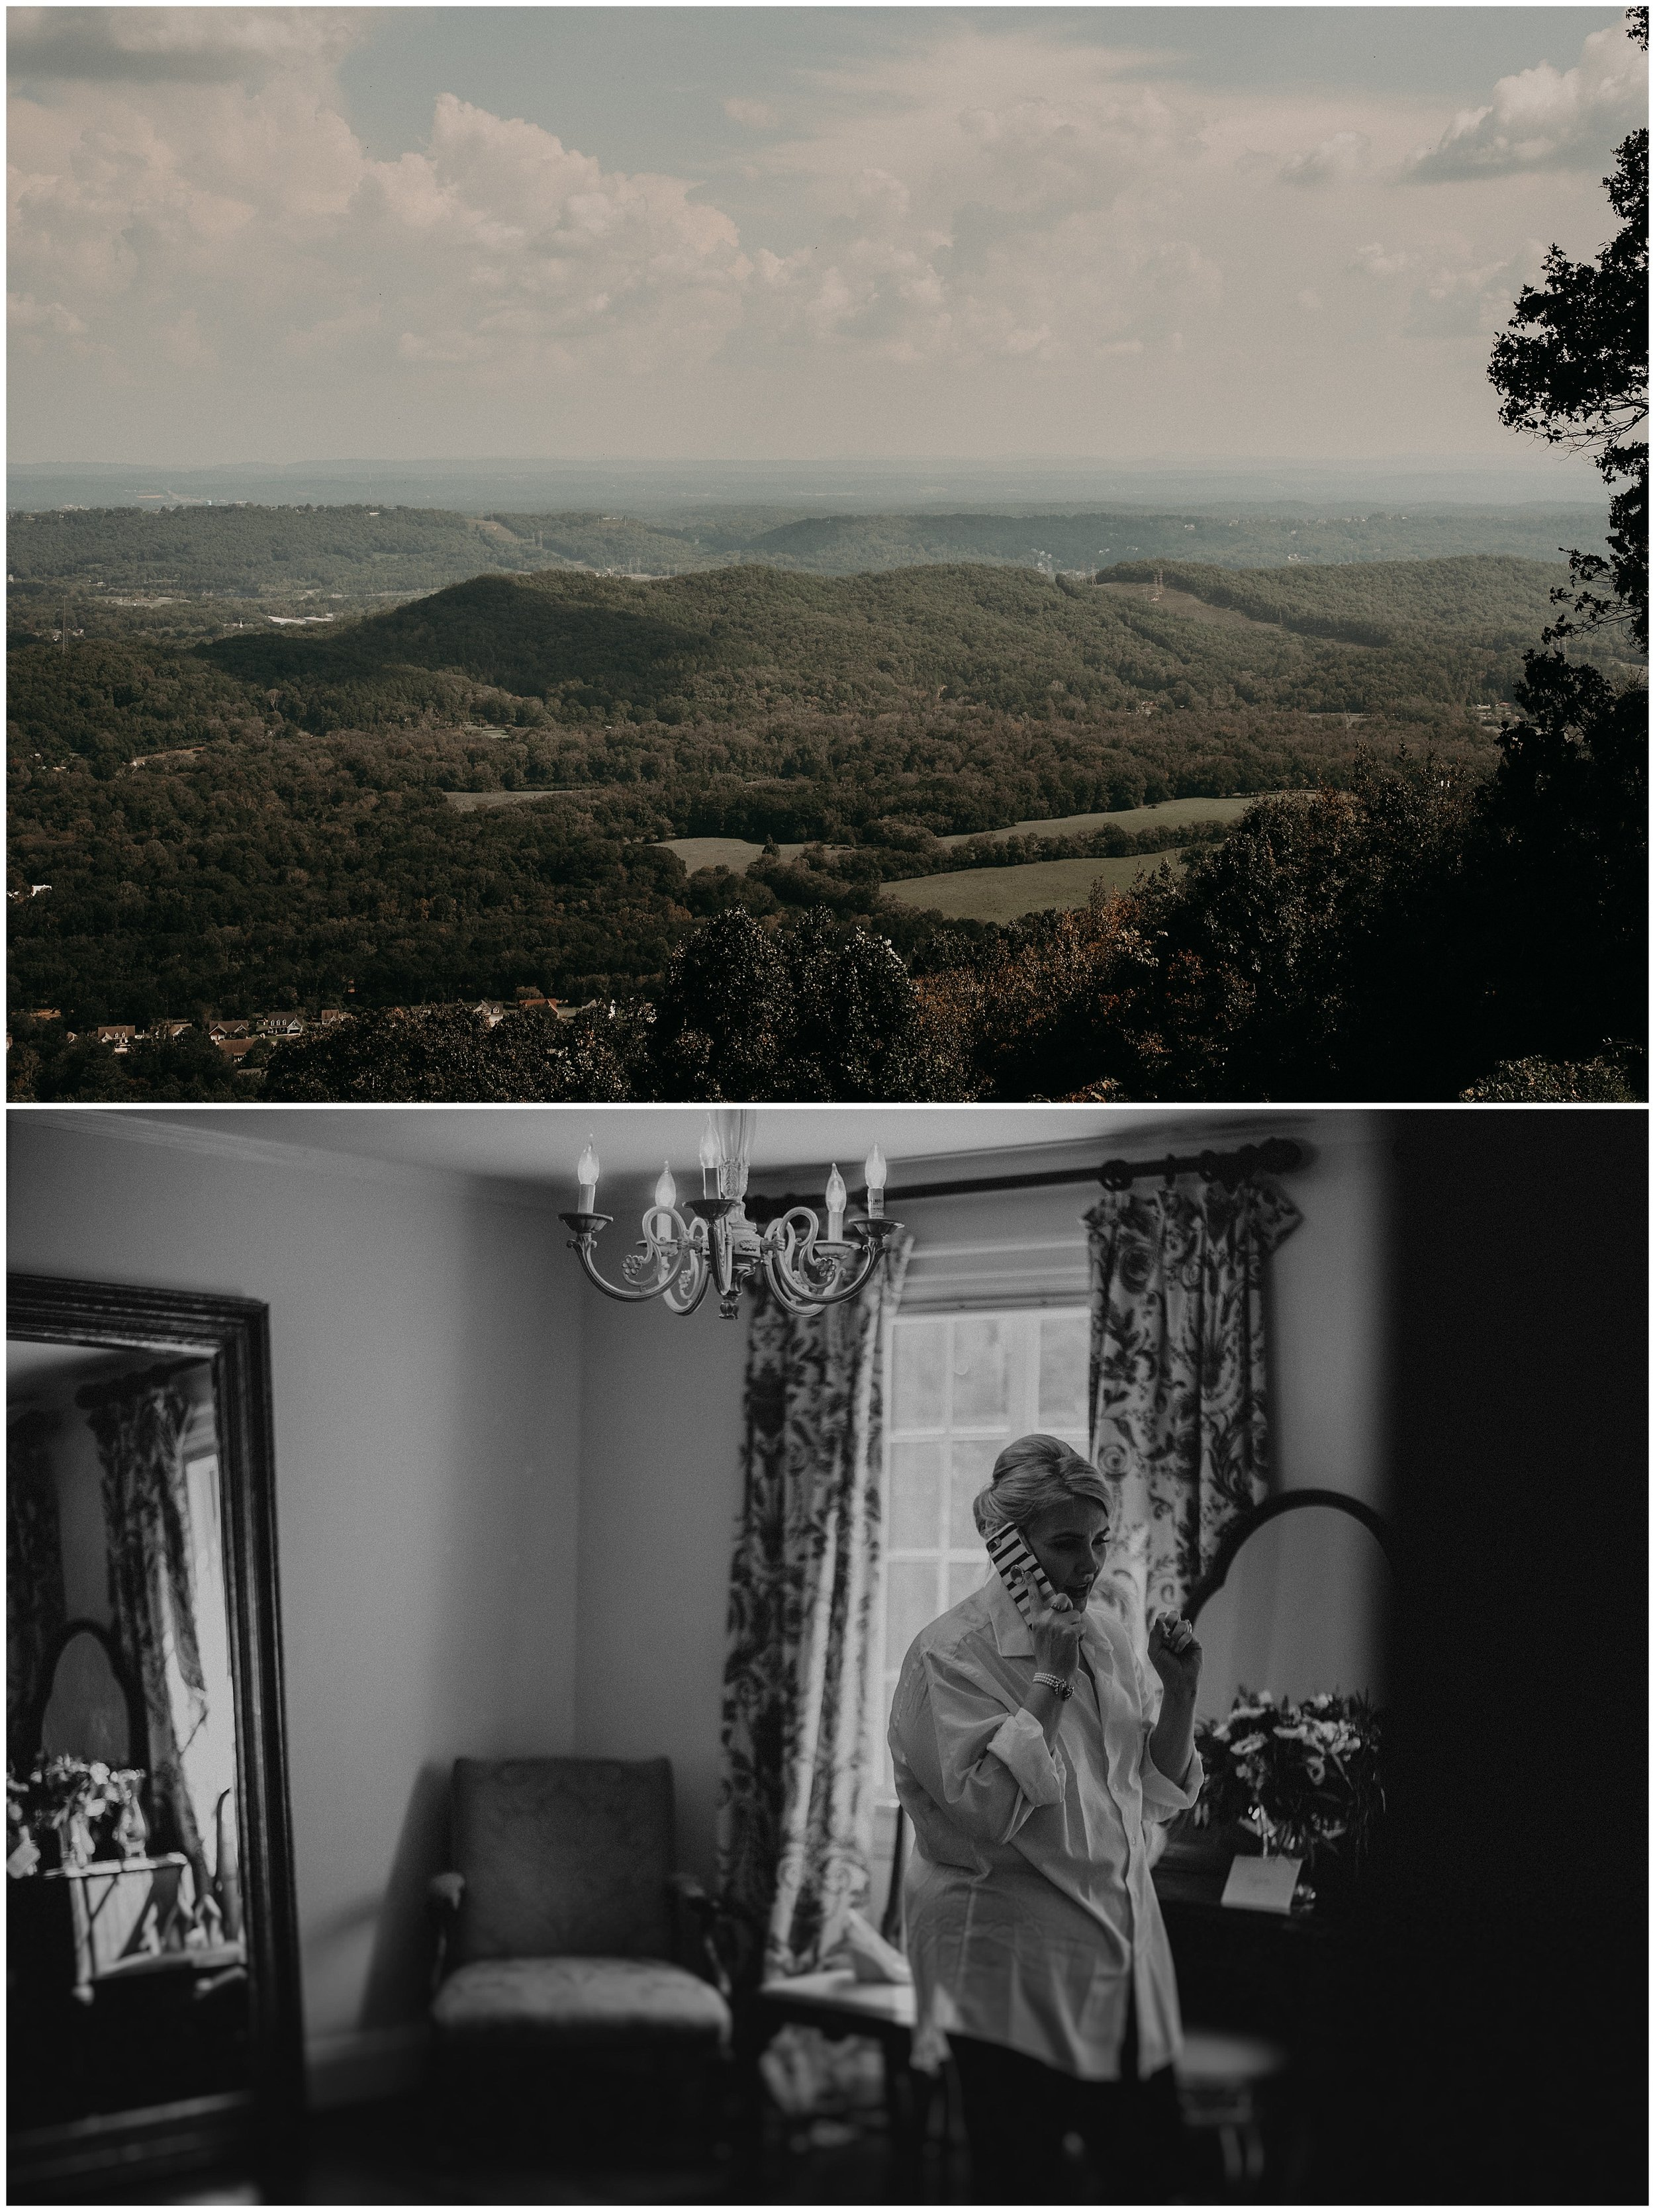 Taylor_English_Photography_Grandview_Lookout_Mtn_GA_0004.jpg